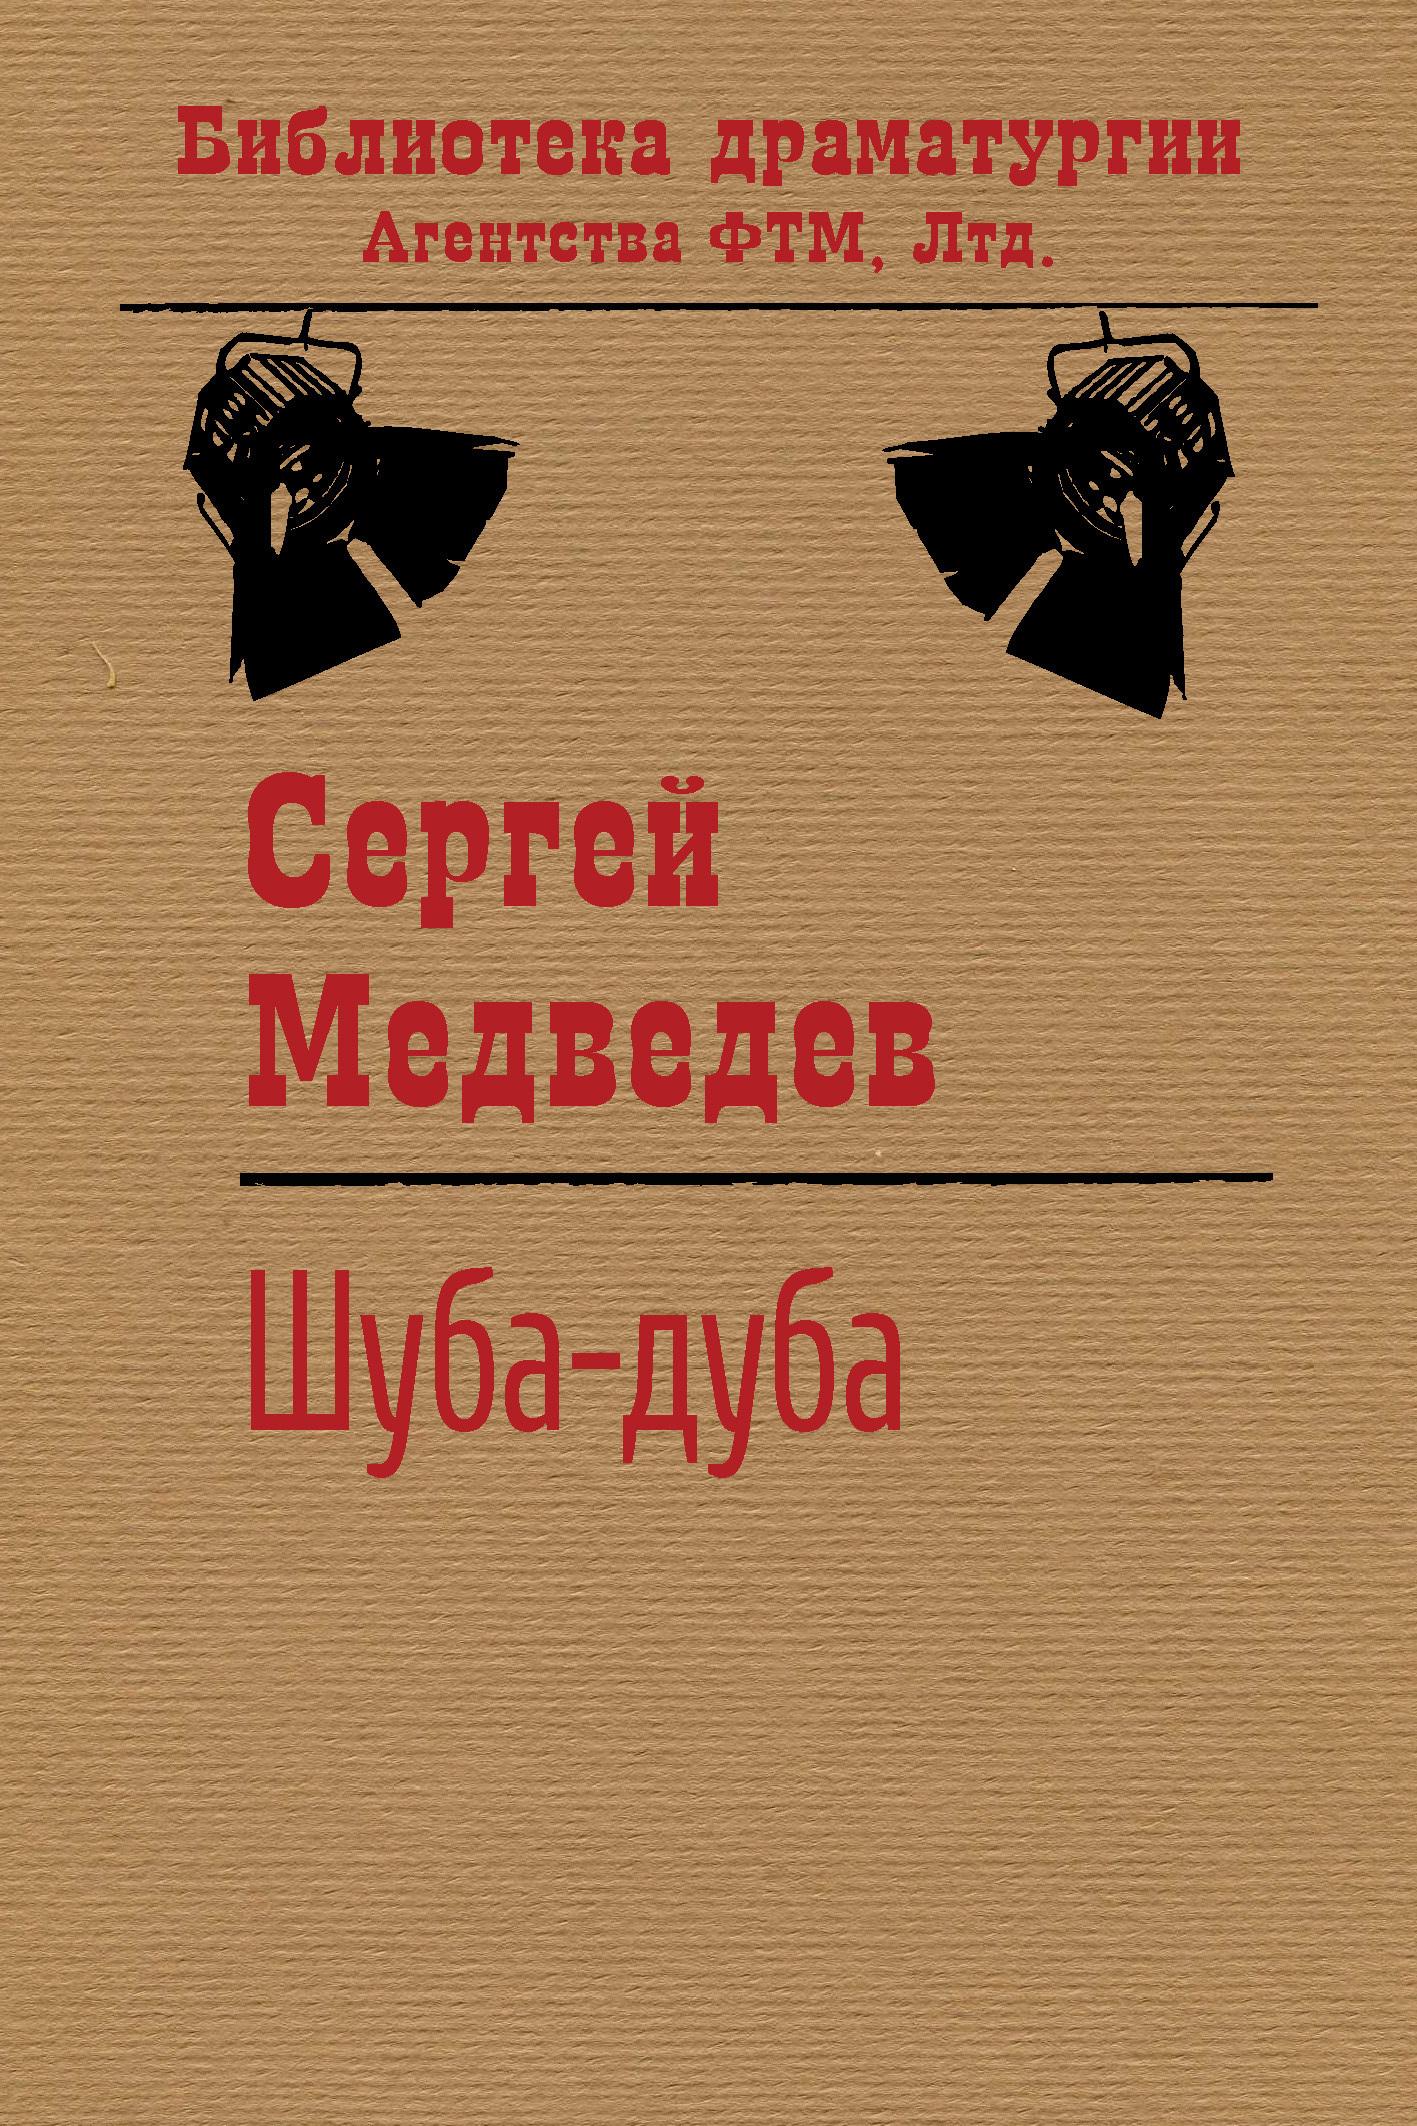 Сергей Медведев - Шуба-дуба